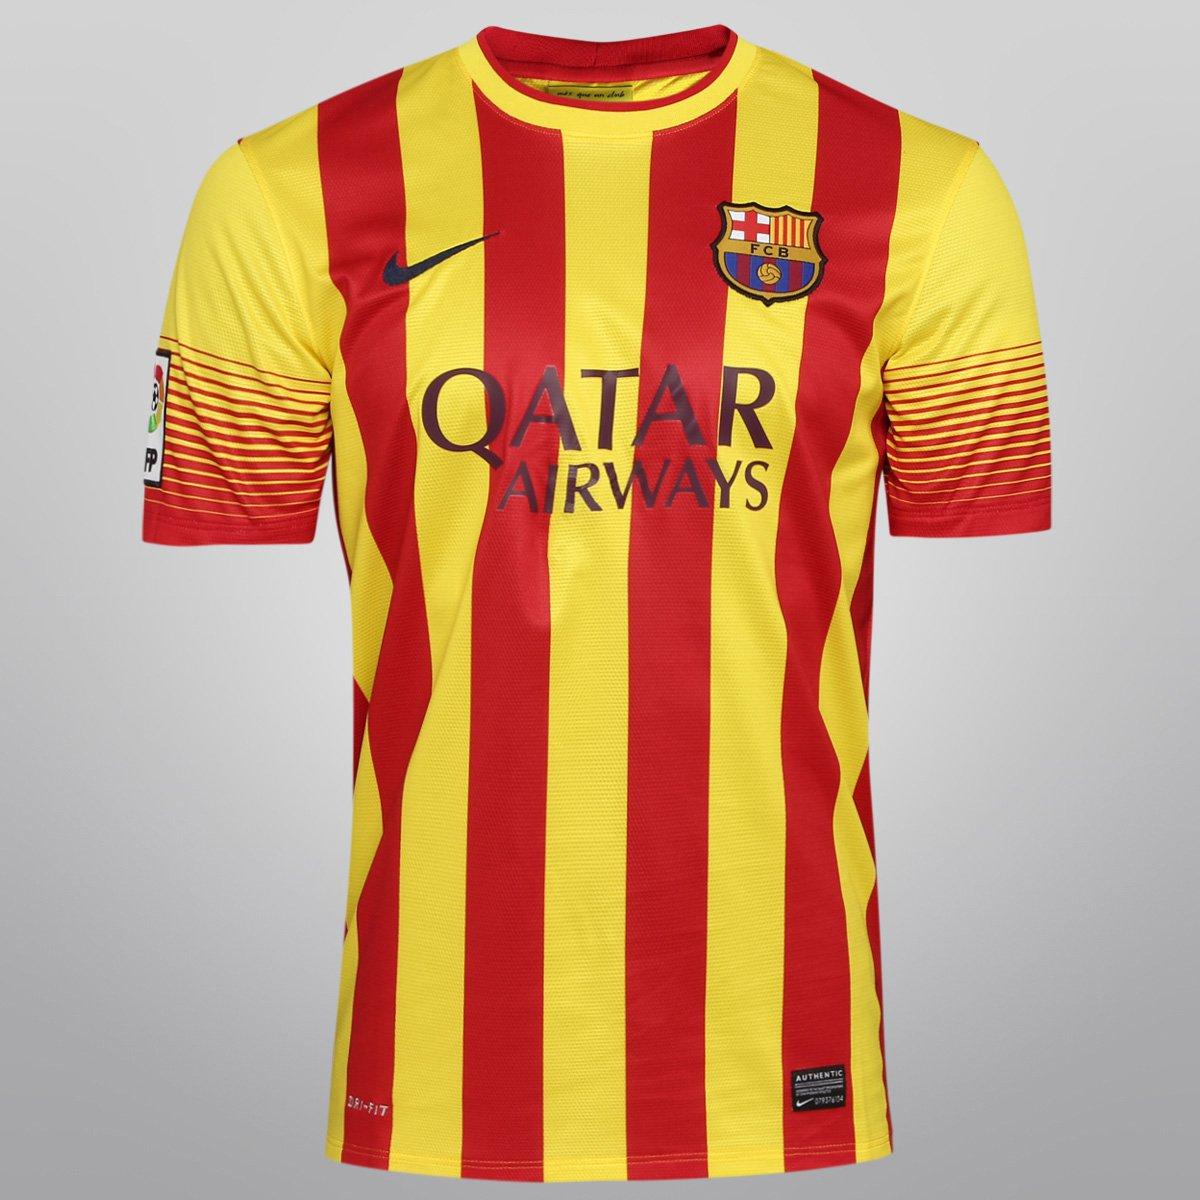 Camisa Nike Barcelona Away 13 14 s nº - Compre Agora  e5c27f5be0b9a